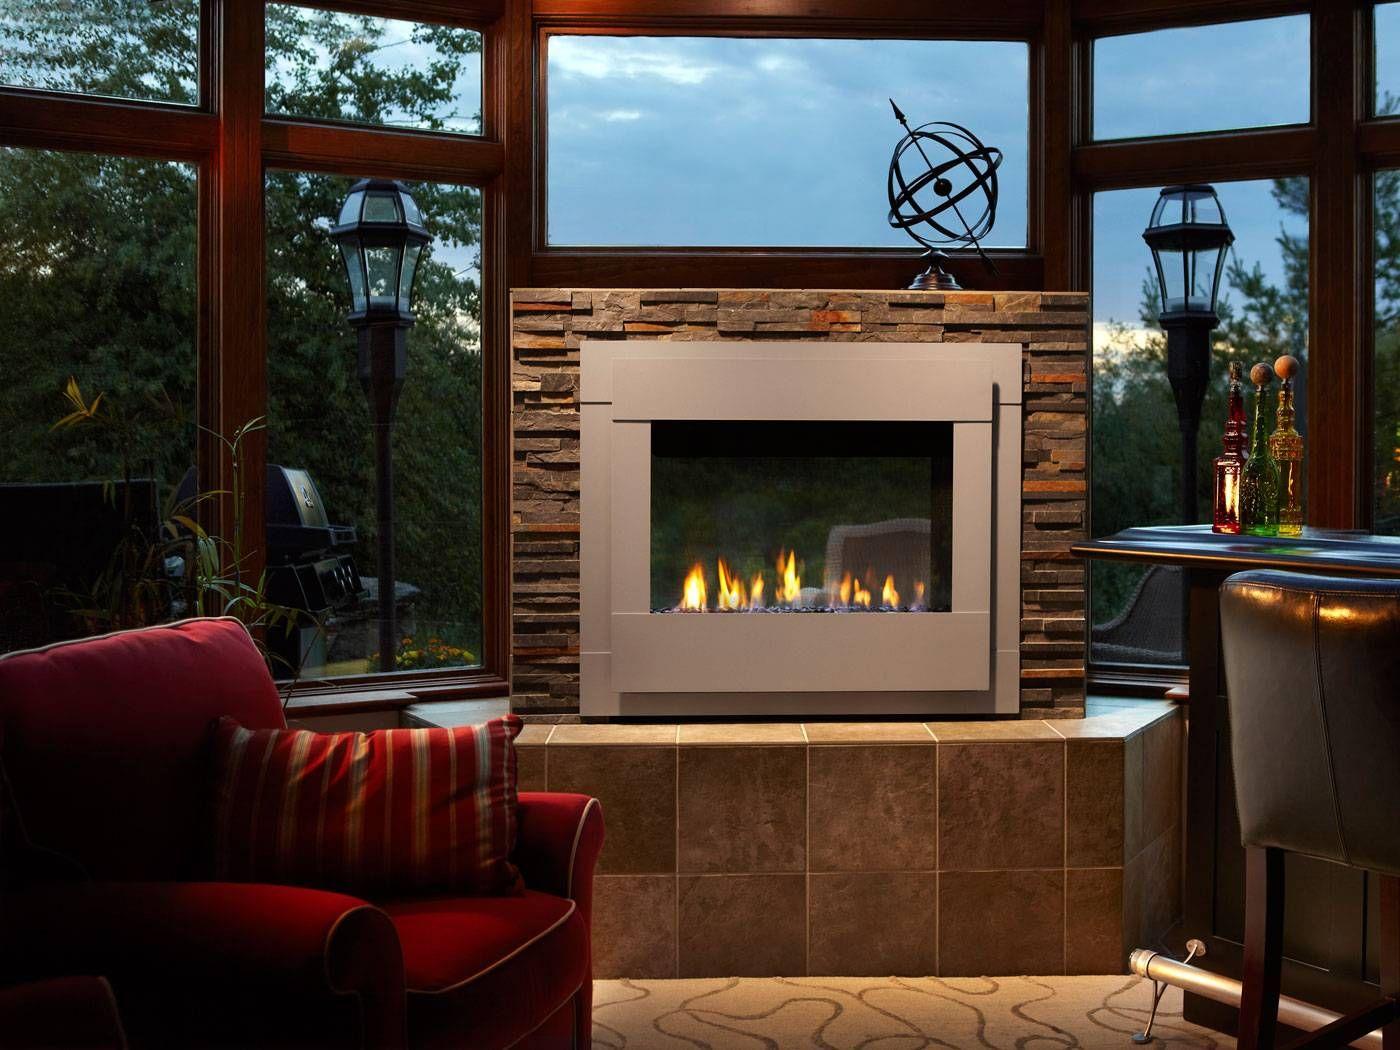 Twilight Indoor/Outdoor Modern Gas Fireplace